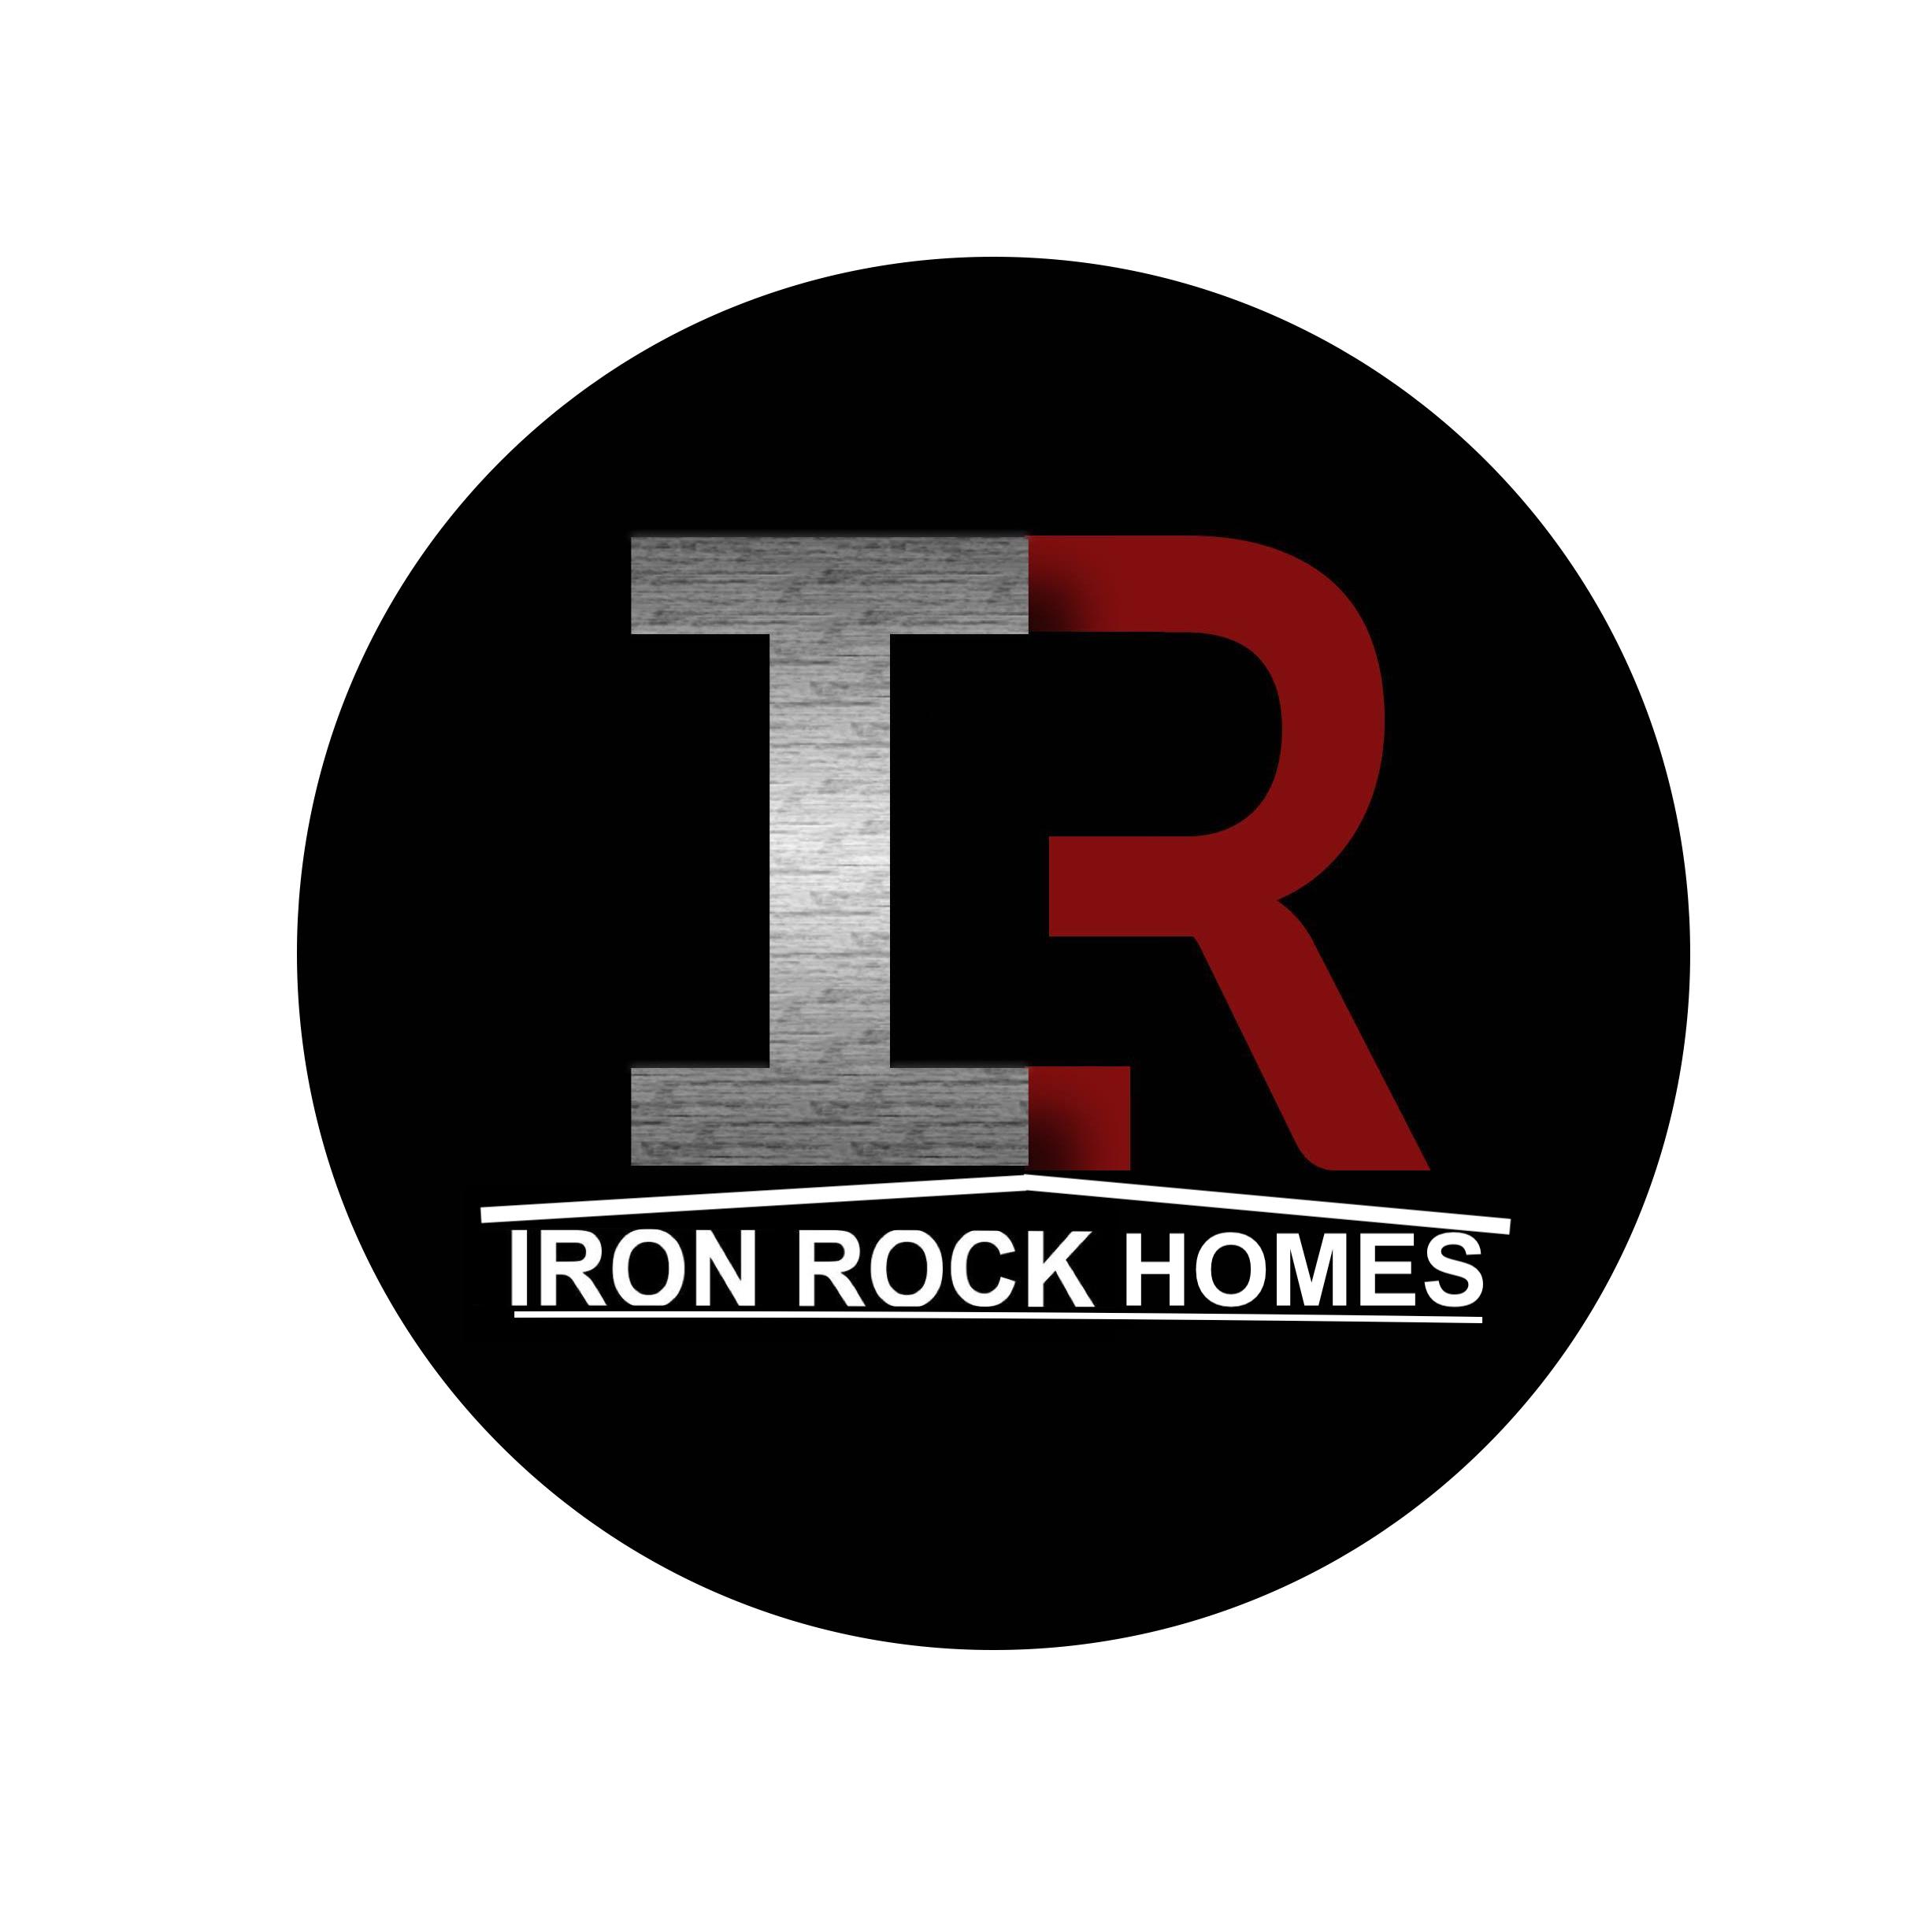 Iron Rock Homes